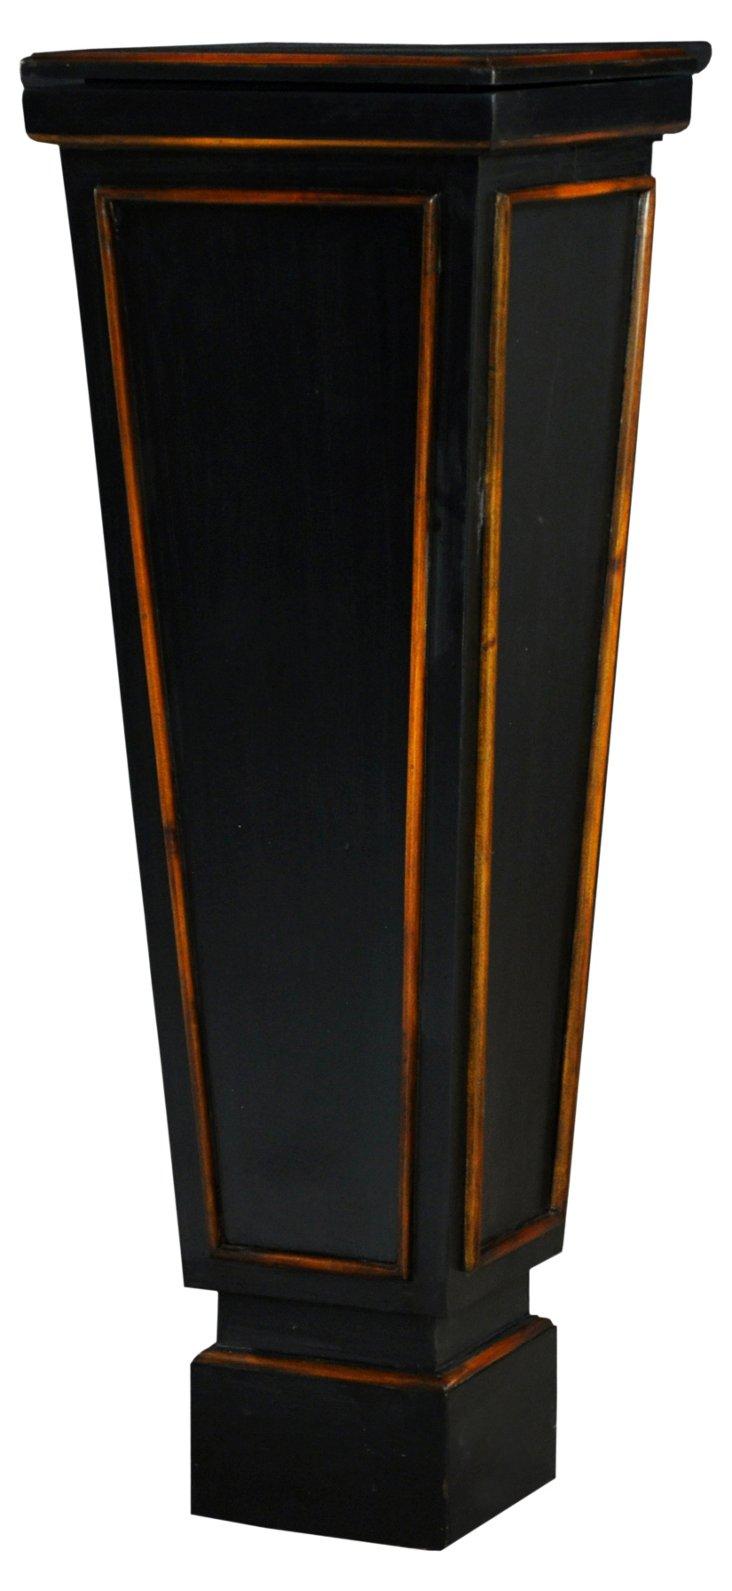 Cantitoe Pedestal, Weathered Black